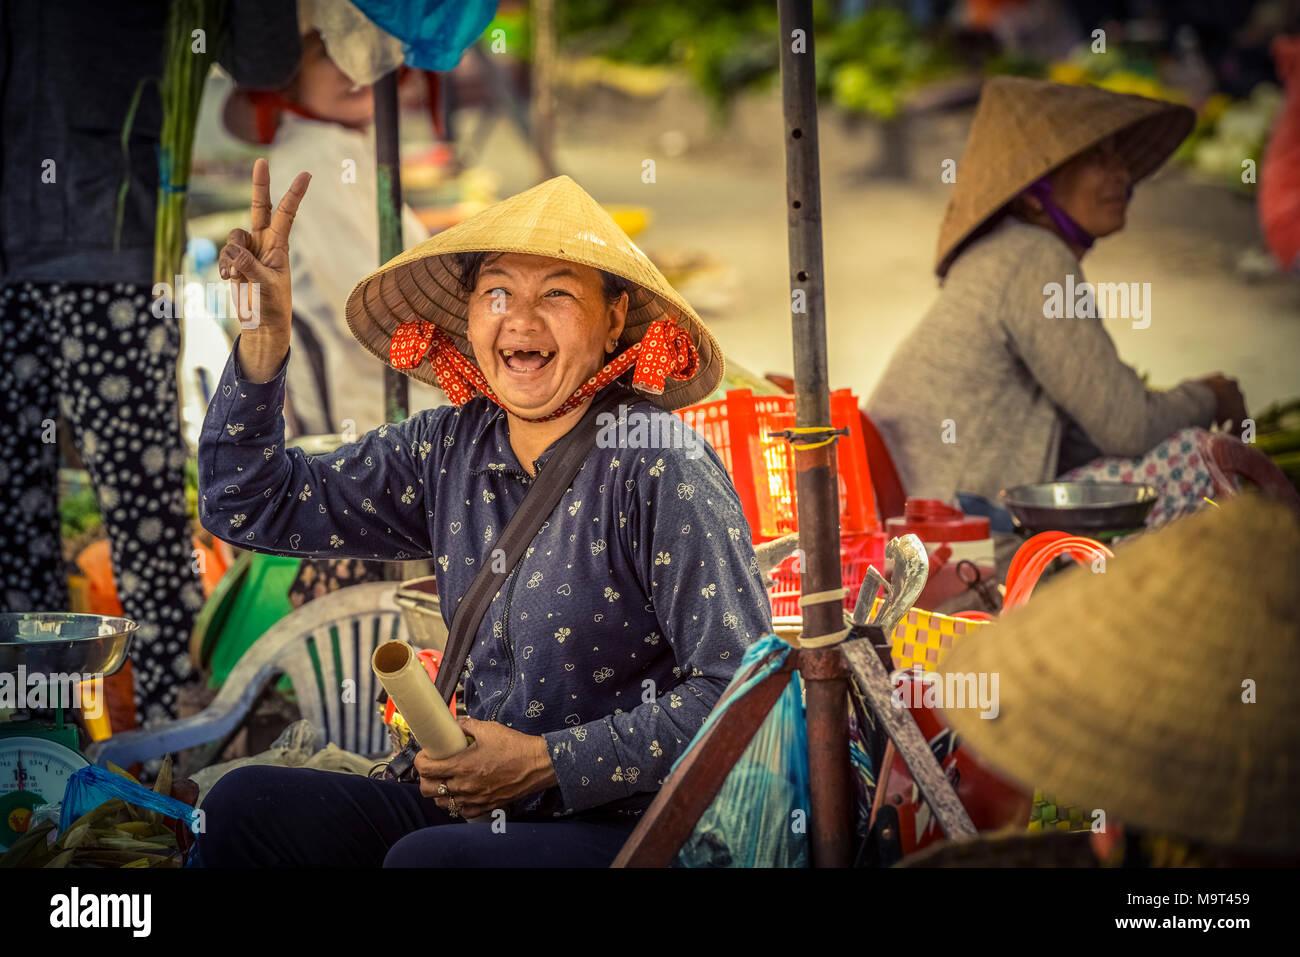 Asien, Südostasien, Südvietnam, Vietnam, Mekong, Delta, Markt Stockbild